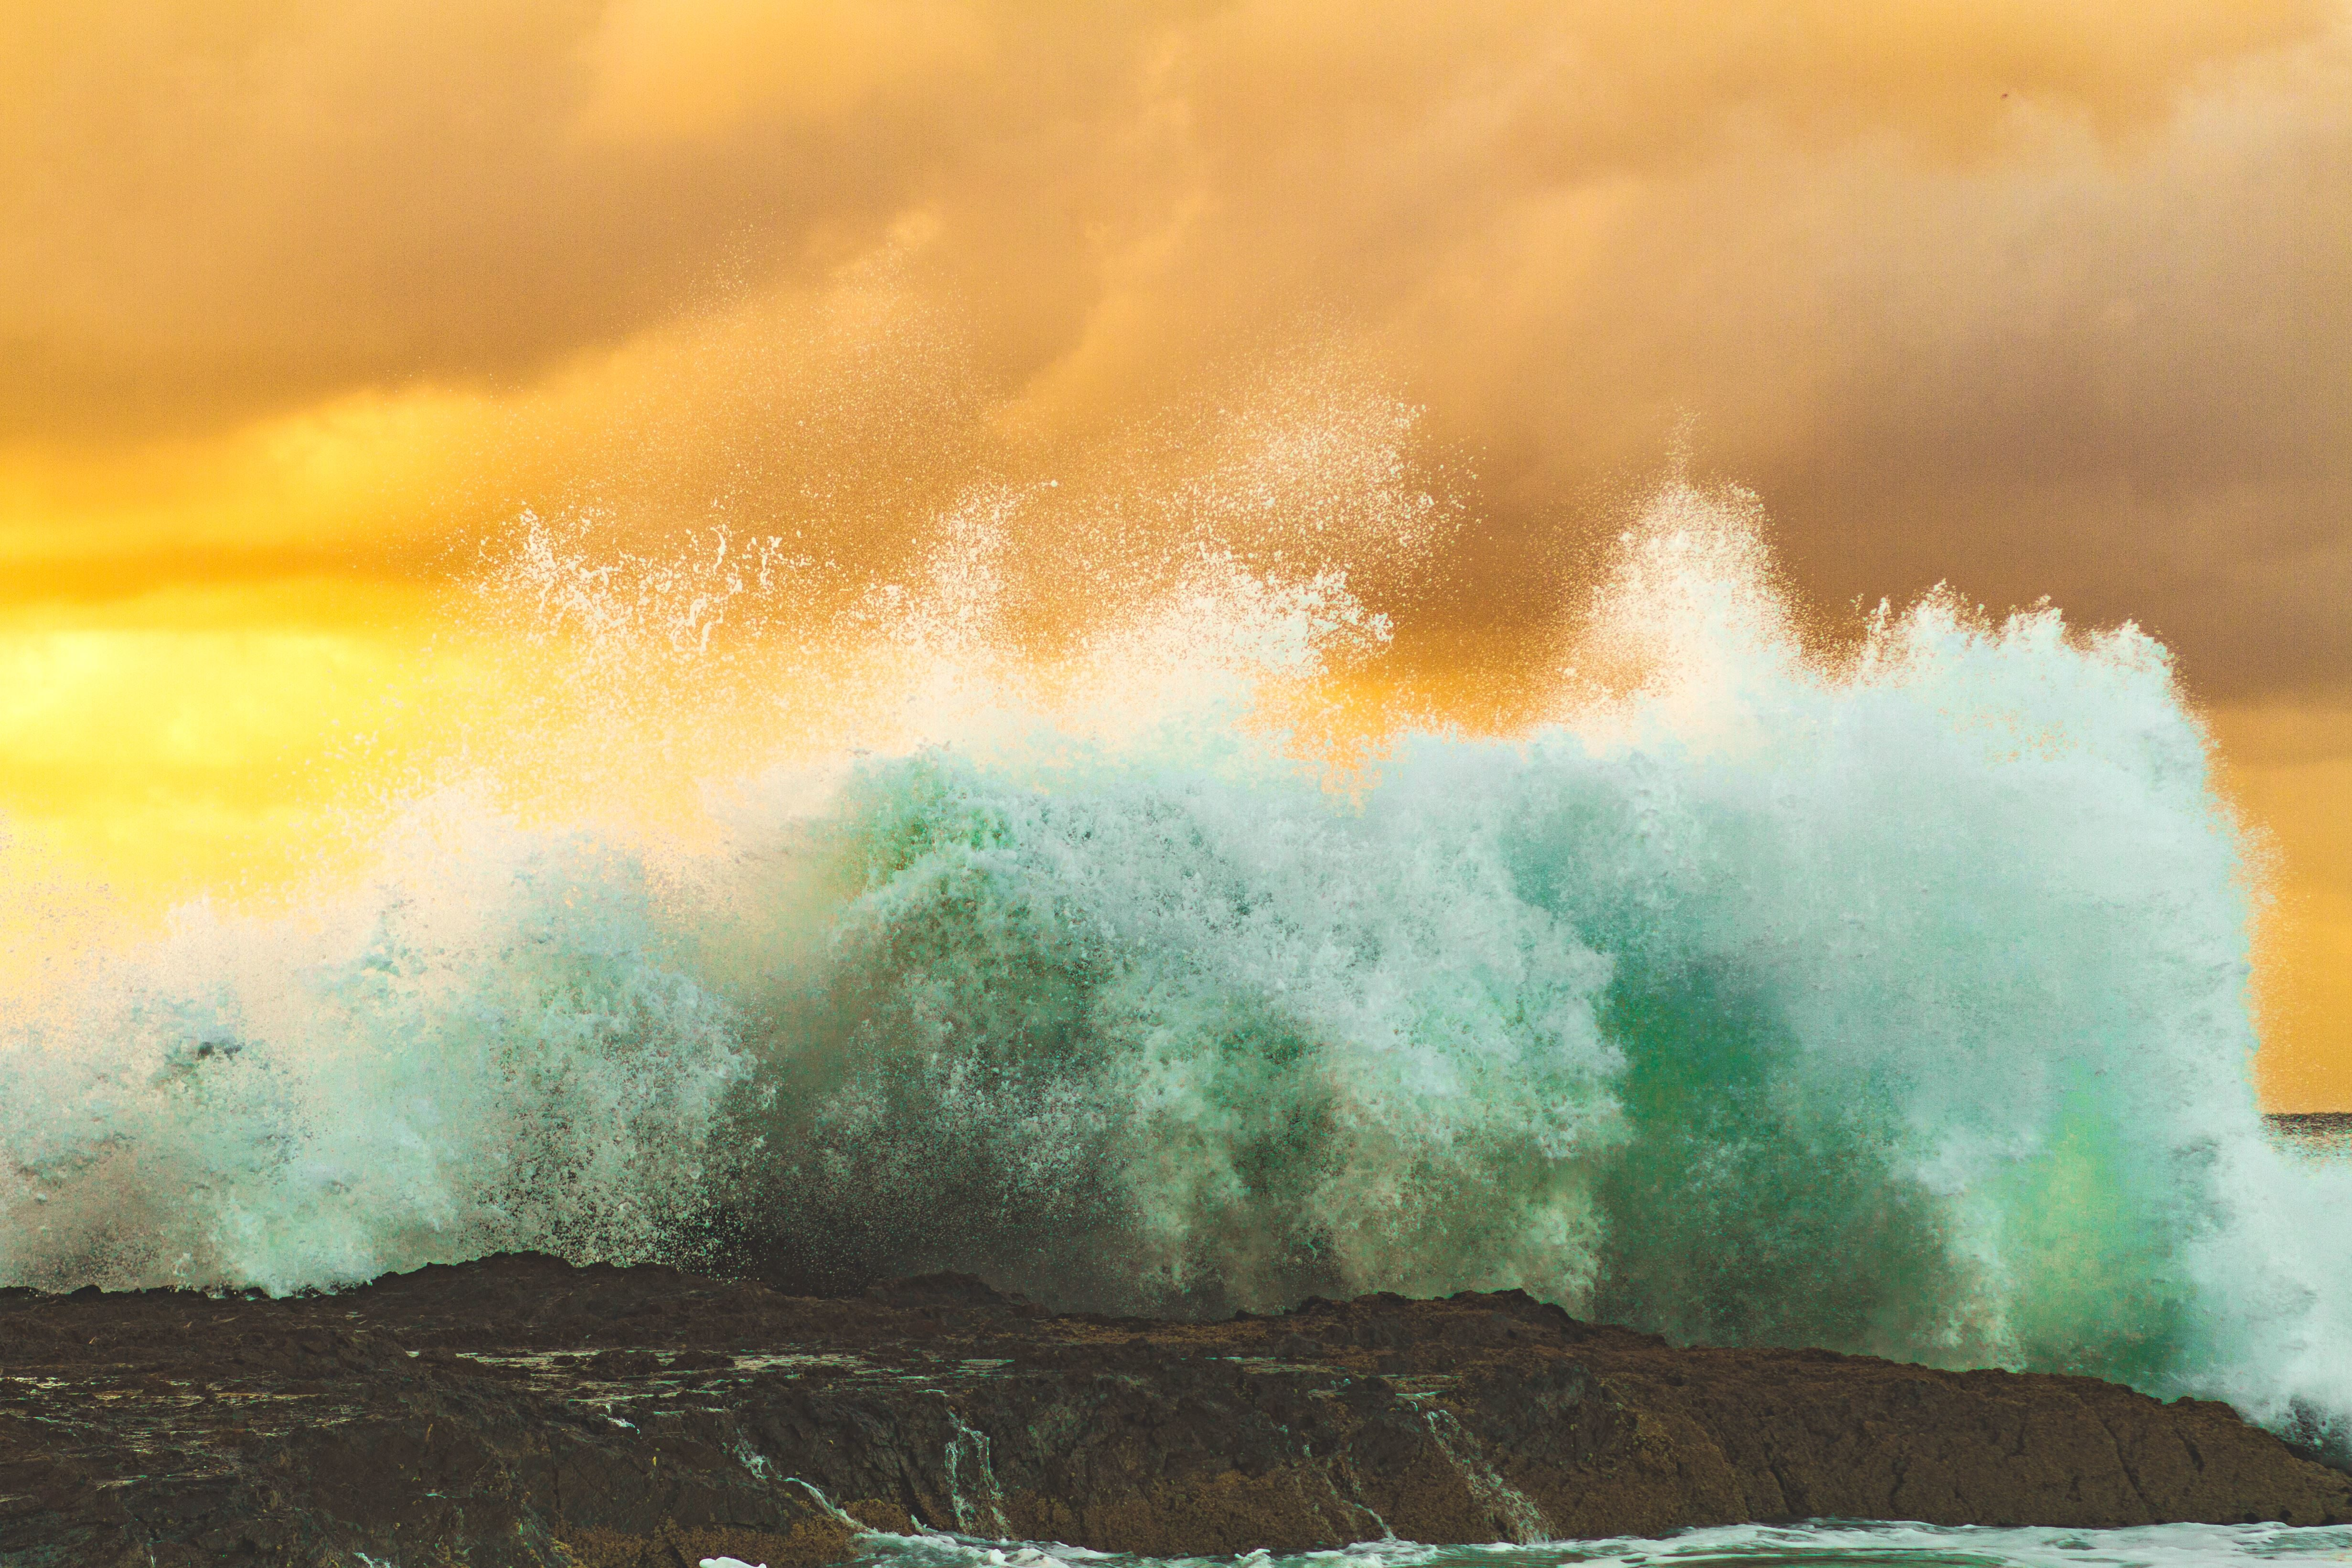 free picture  beach  coast  rock  sea  water  splash  waves